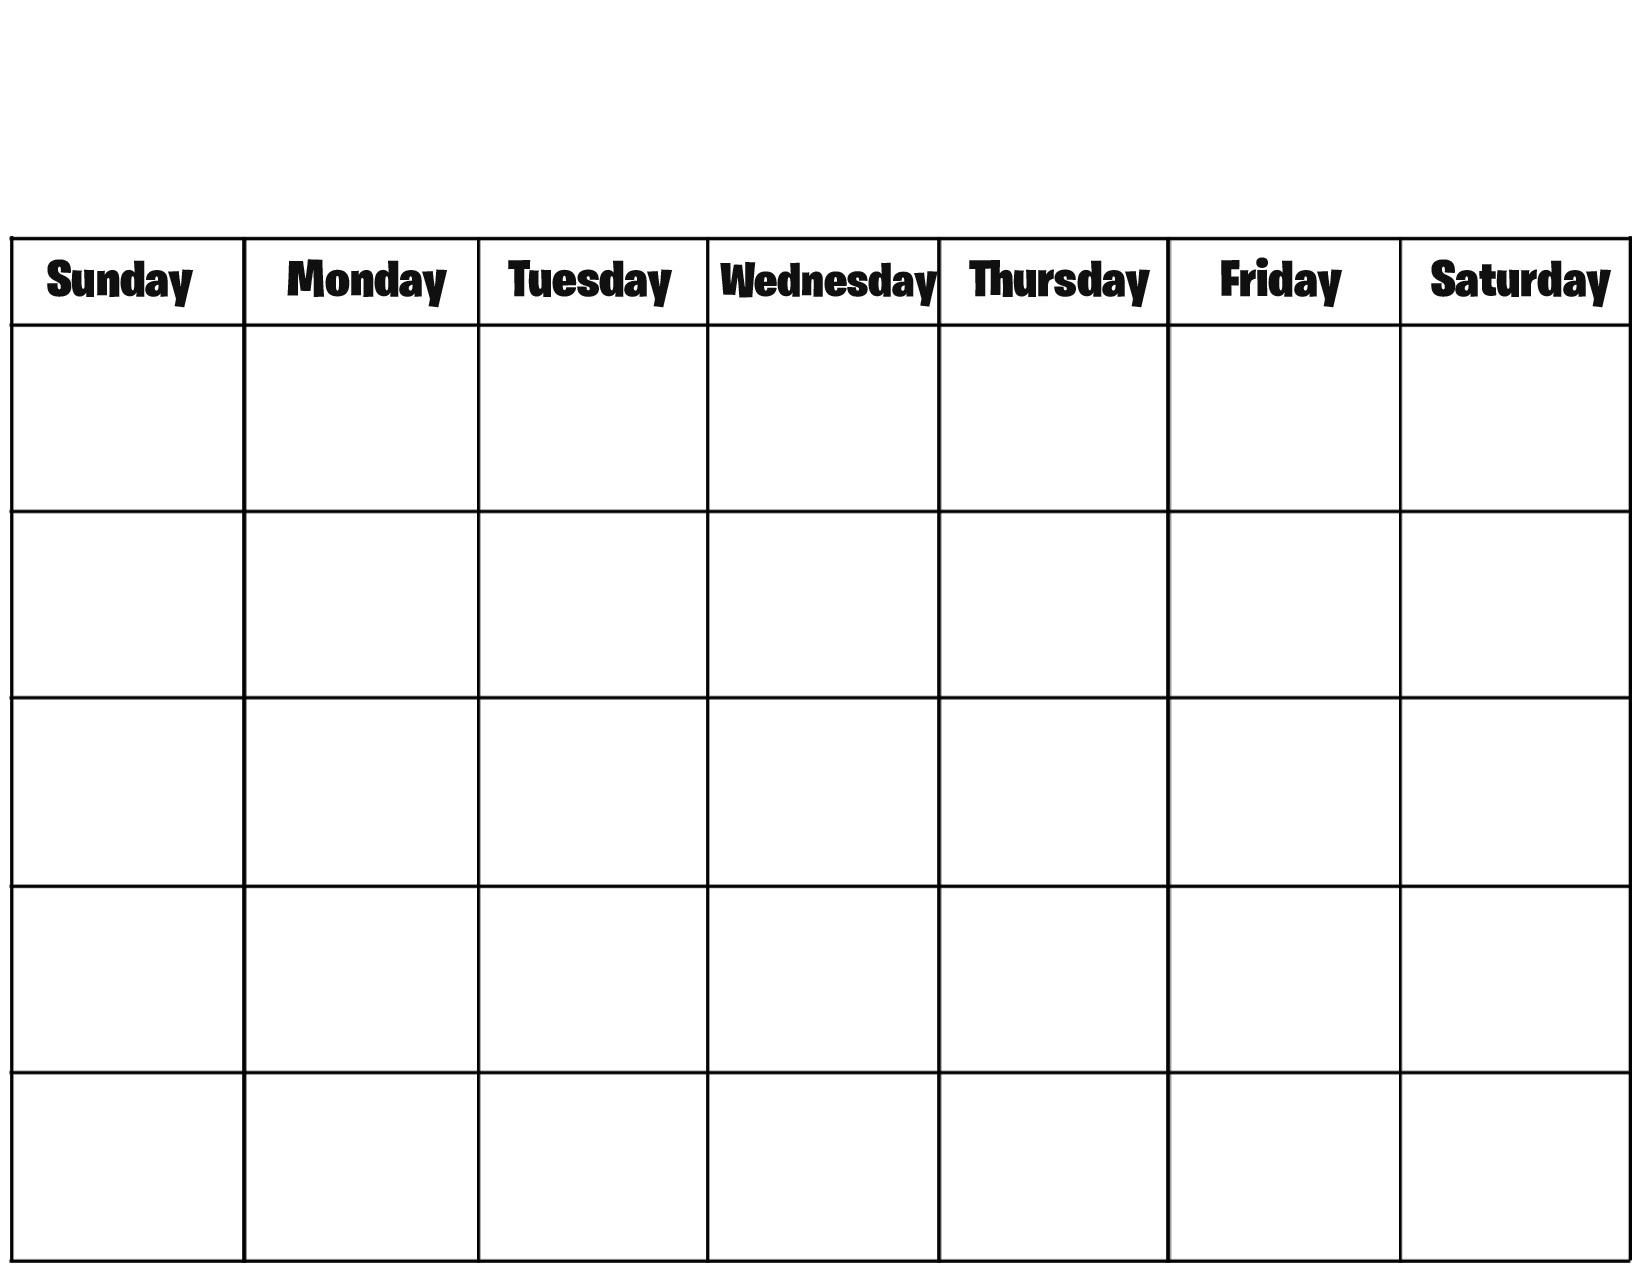 Free Calendar Print Out Blackdgfitnessco  Xjb